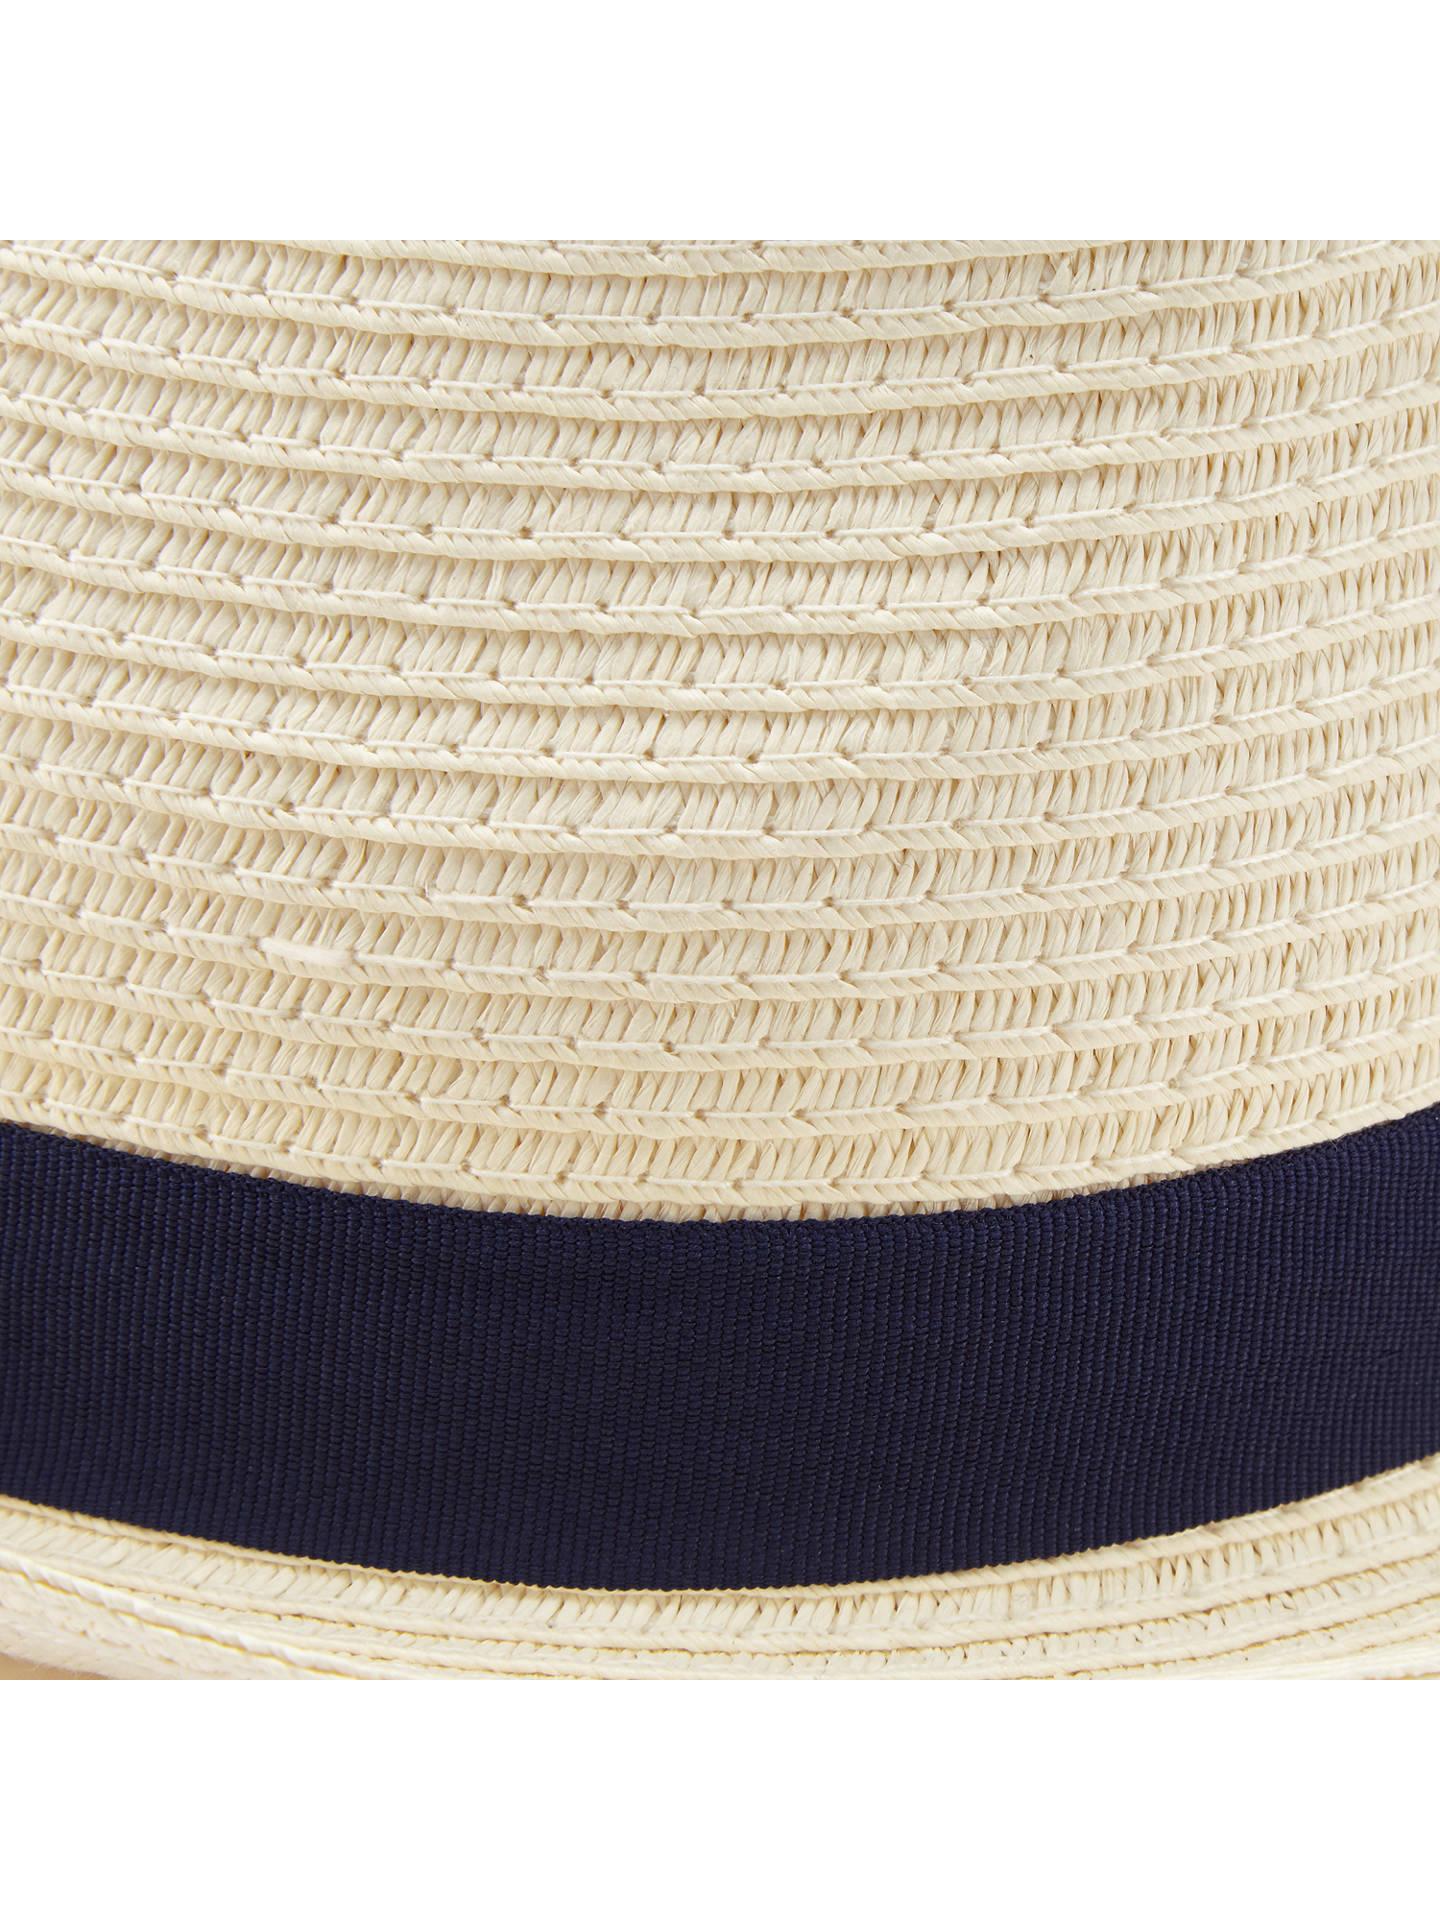 ... BuyJohn Lewis Packable Braid Trilby Hat e77634b2704a